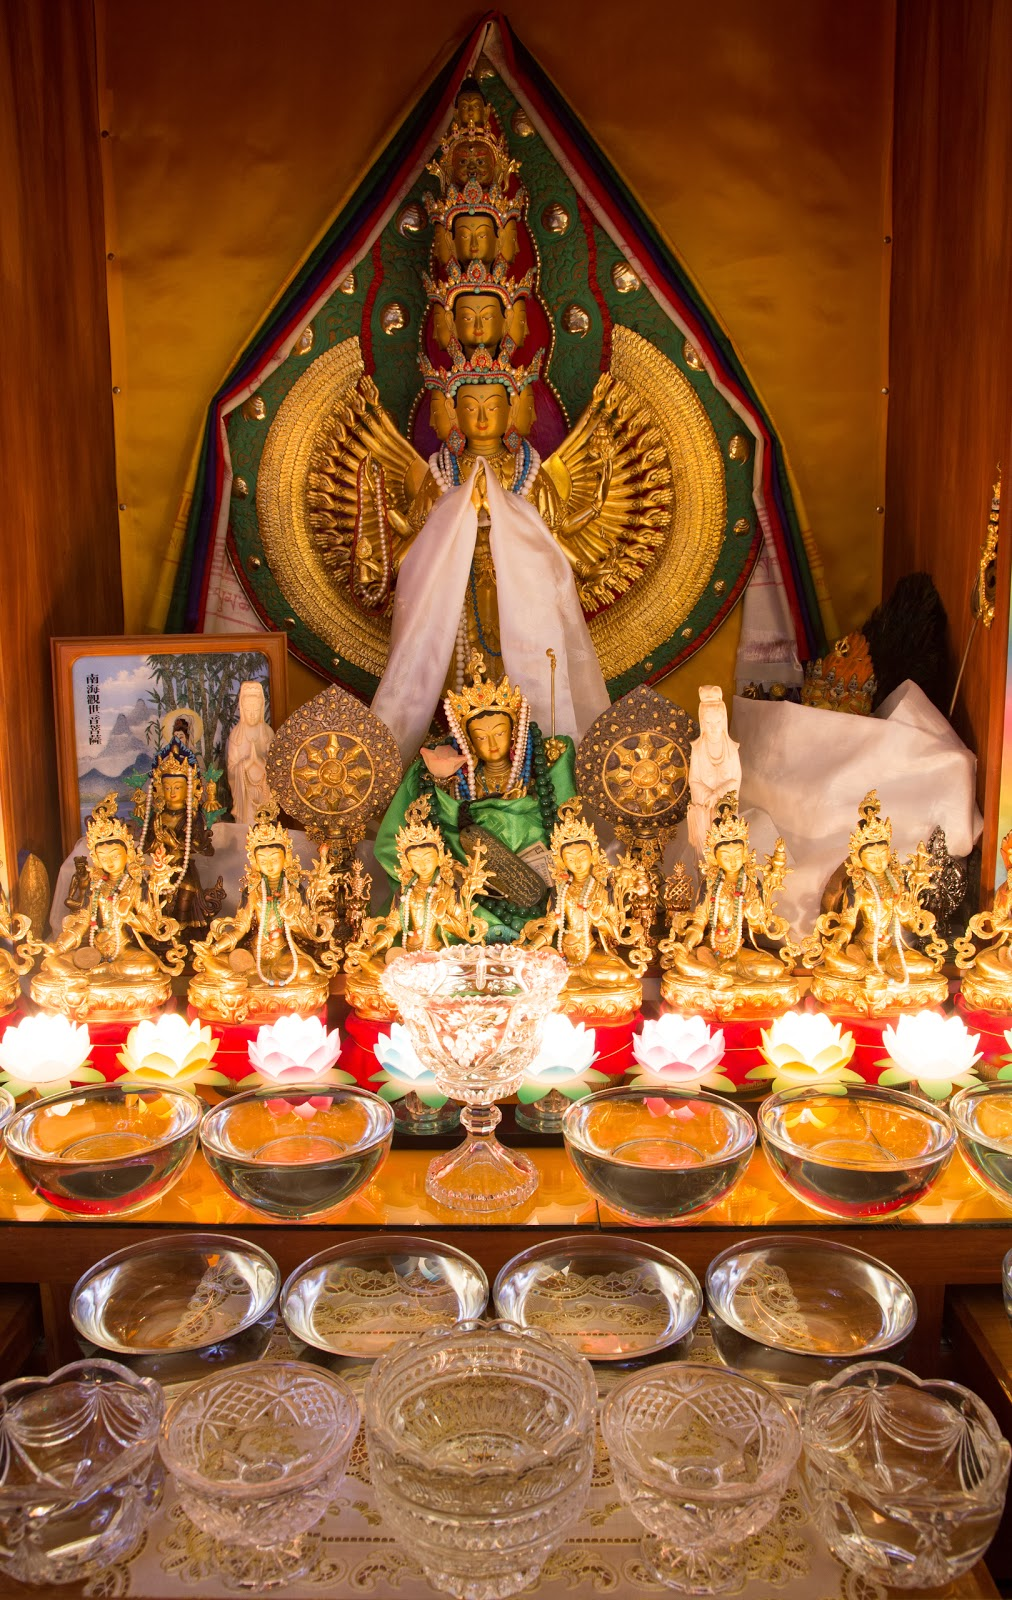 Chenrezig Altar. Photo by Ven. Thubten Kunsang.